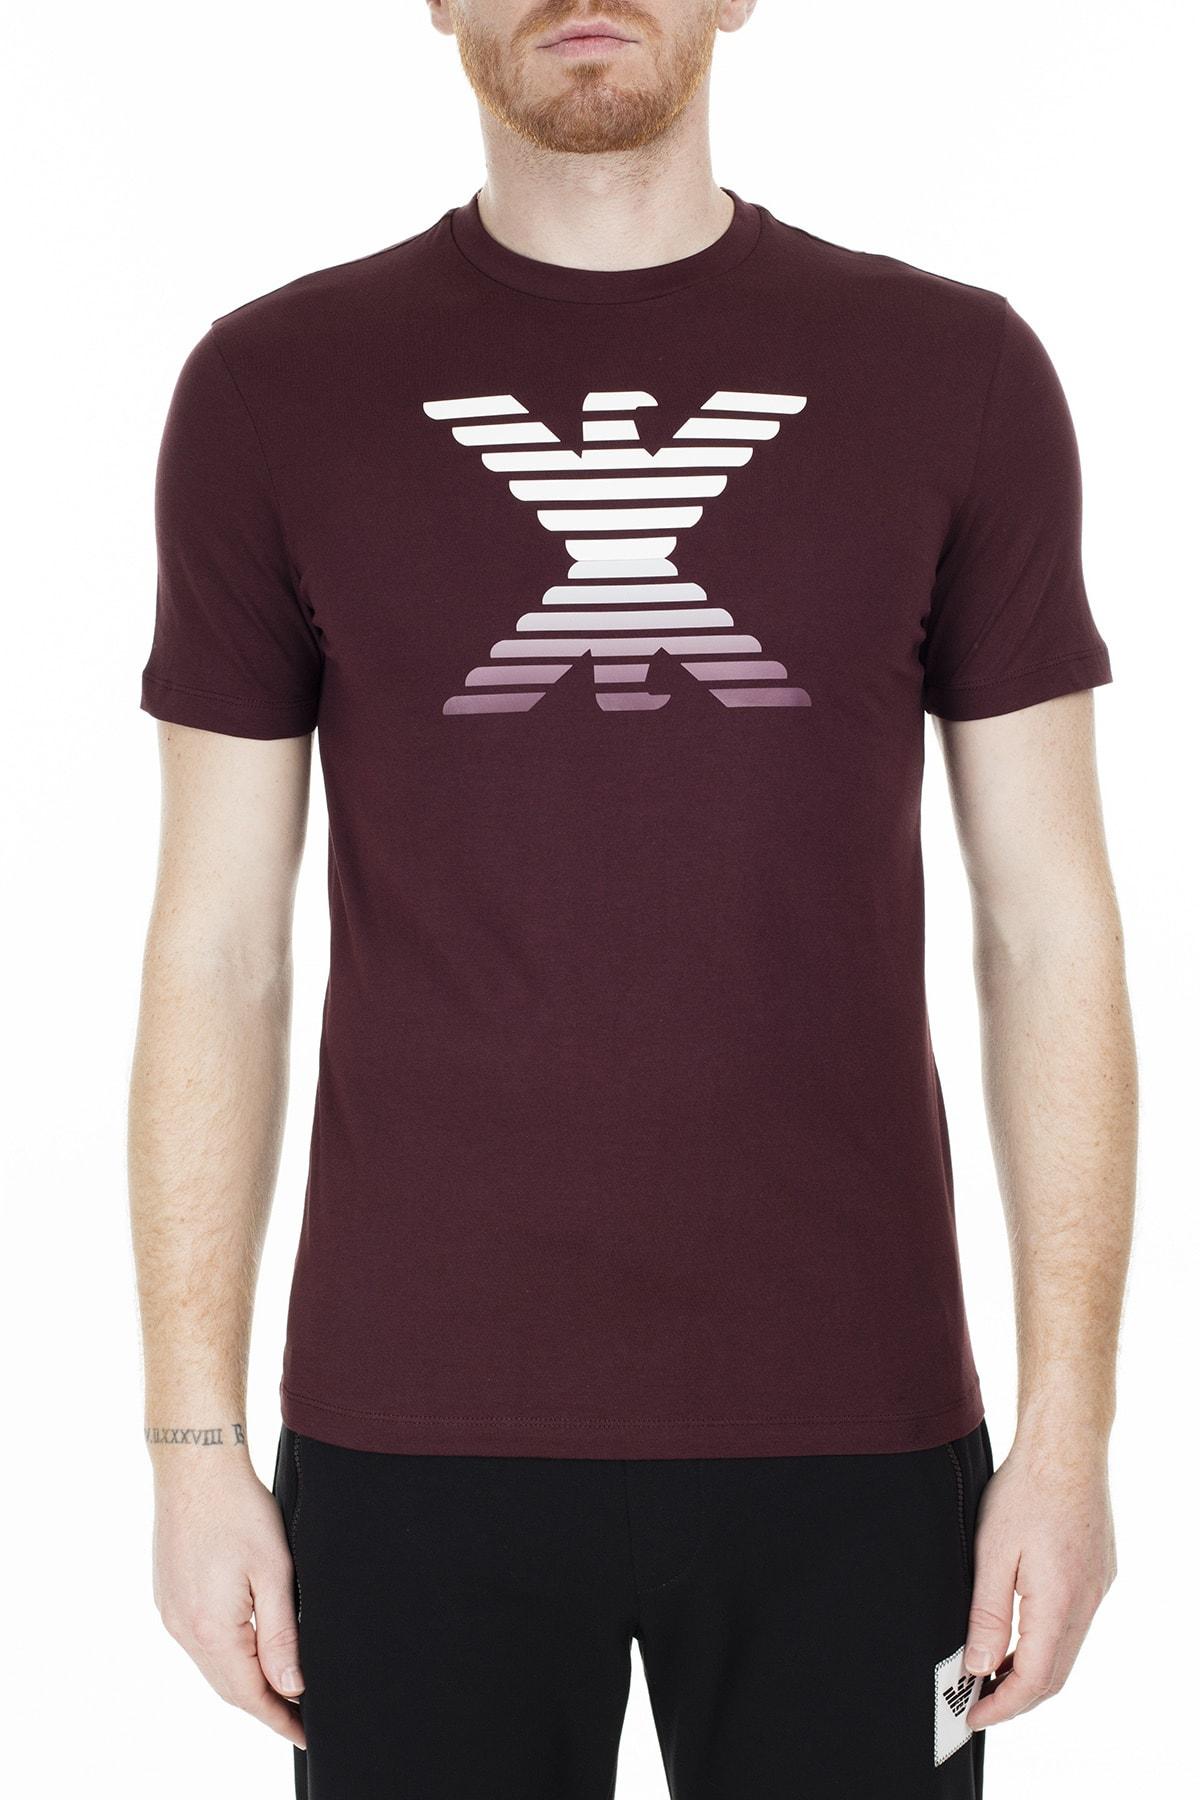 Emporio Armani Regular Fit T Shirt Erkek T Shirt S 6G1Tc3 1J00Z 0340 S 6G1TC3 1J00Z 0340